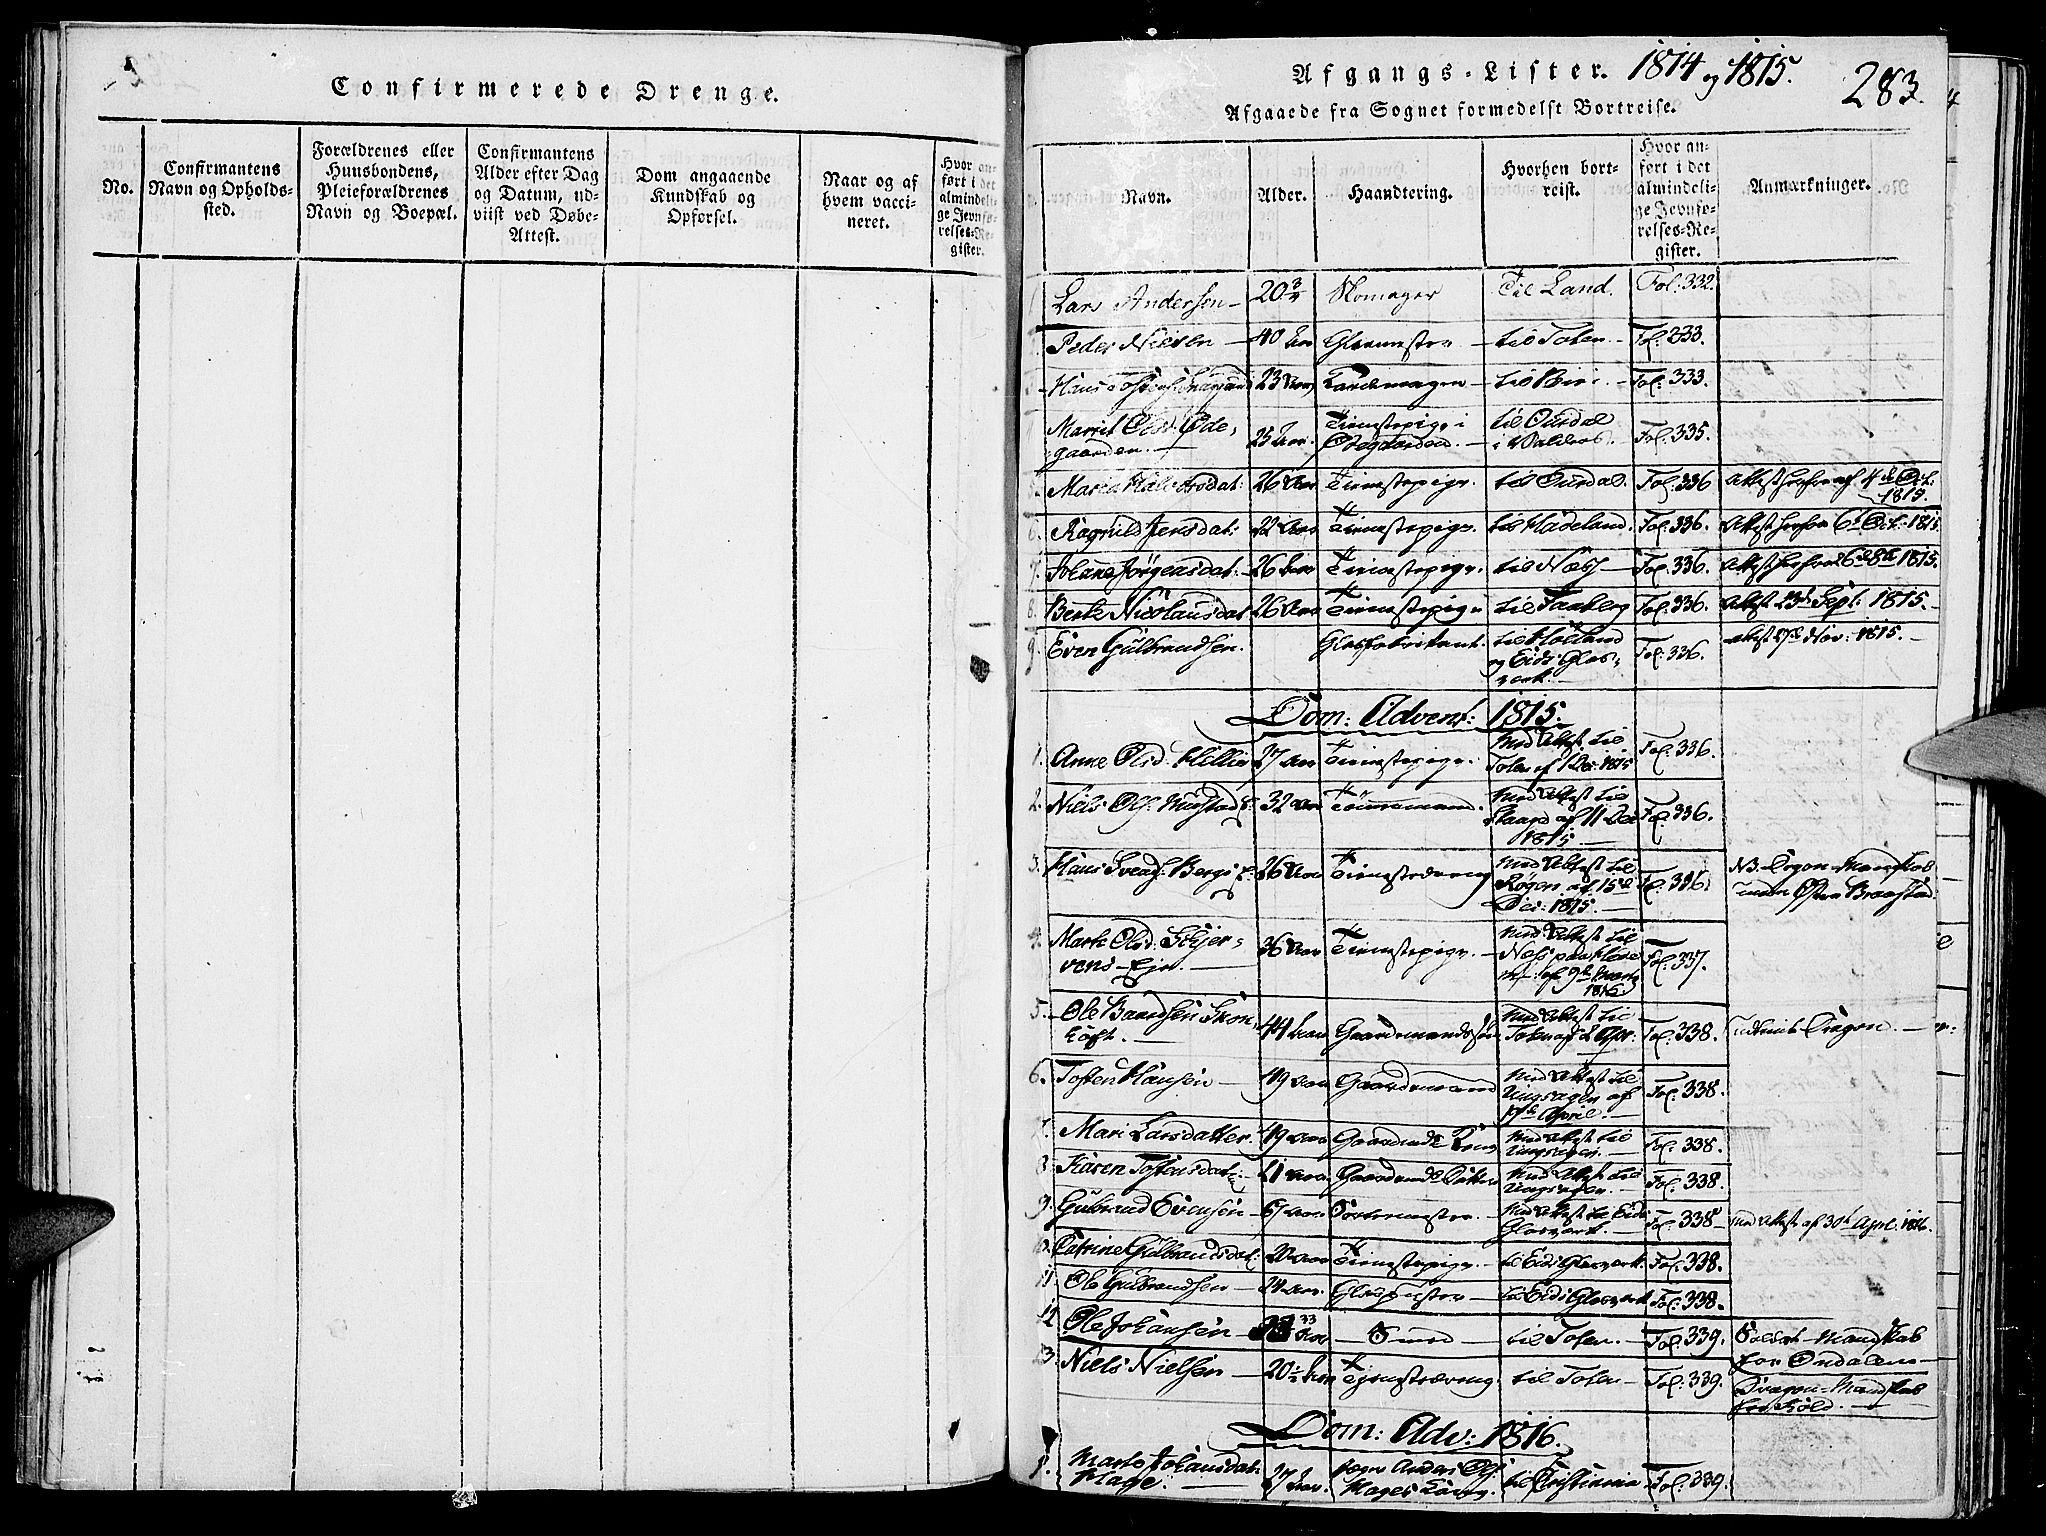 SAH, Vardal prestekontor, H/Ha/Haa/L0004: Ministerialbok nr. 4, 1814-1831, s. 283